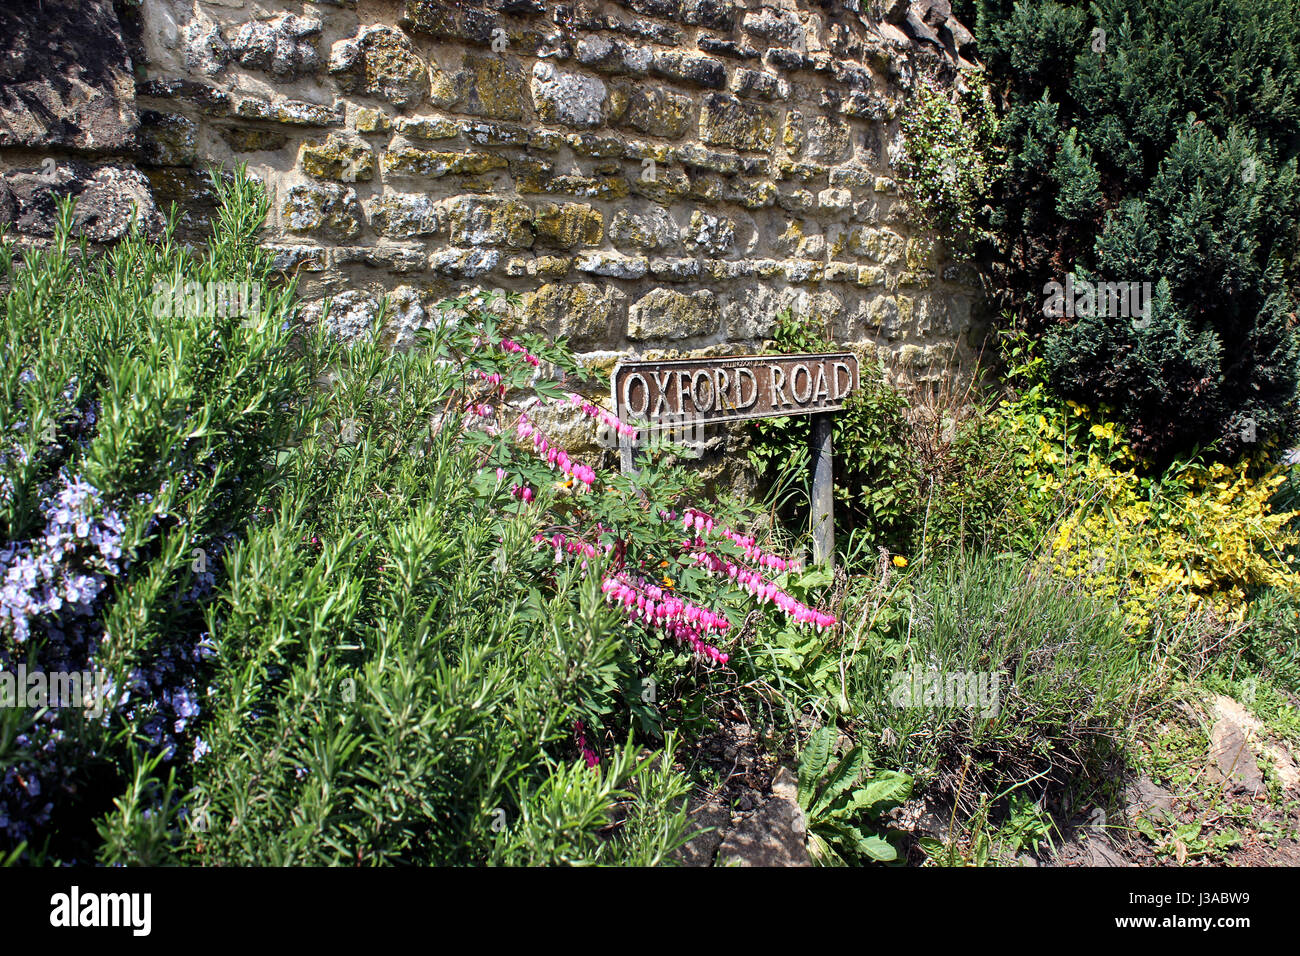 Summer planting Oxford Road Garsington Village - Stock Image